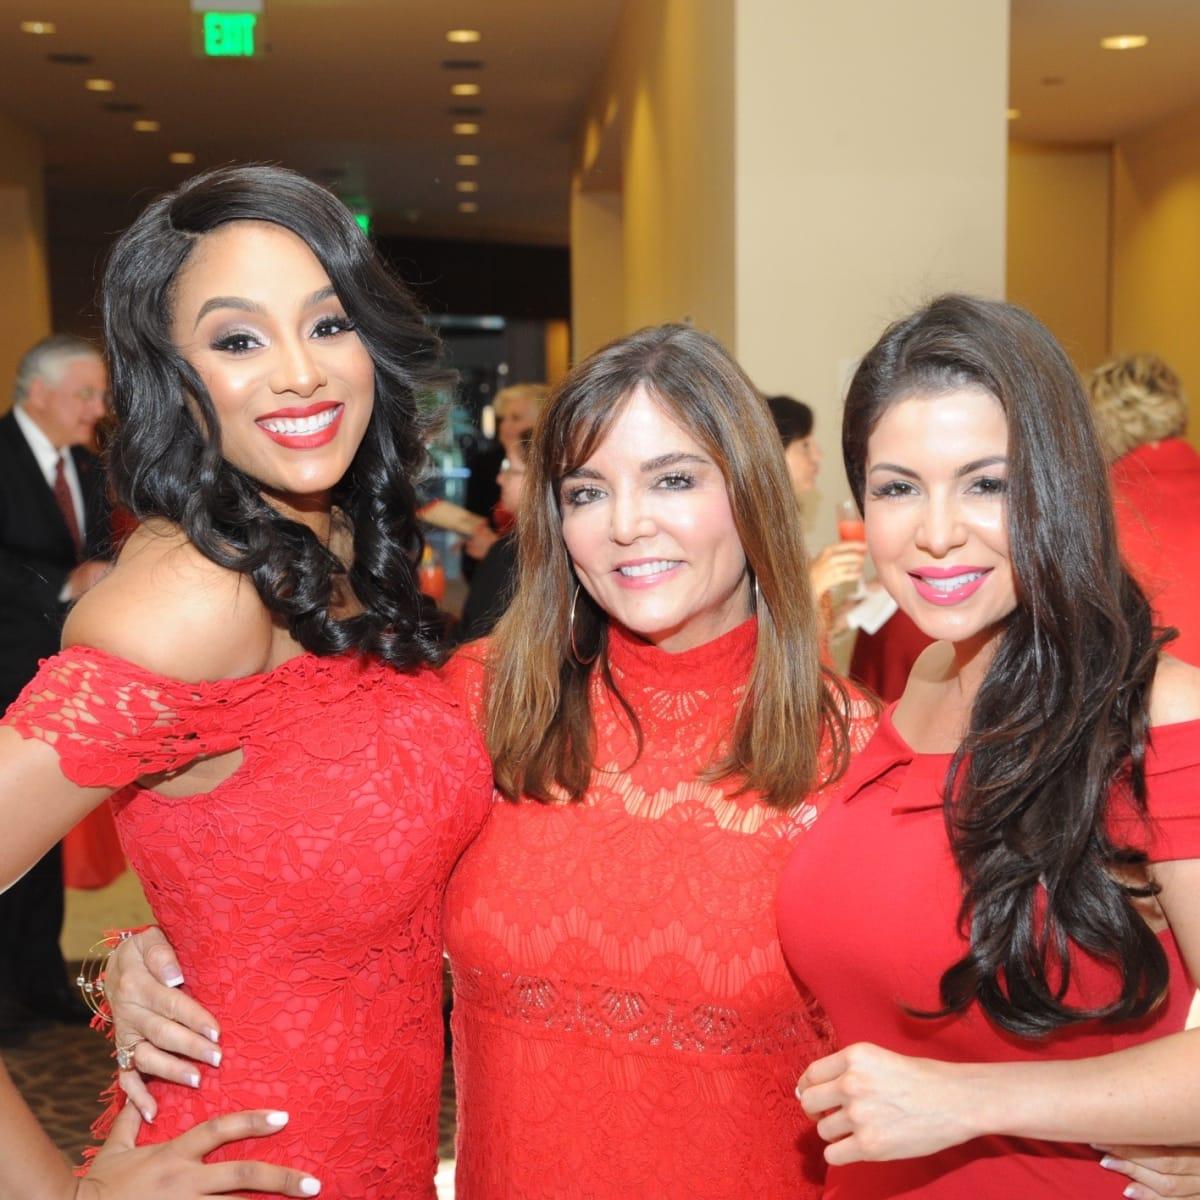 Go Red for Women luncheon Ashley Peterson, Beth Cassidy, Crystal Saldivar